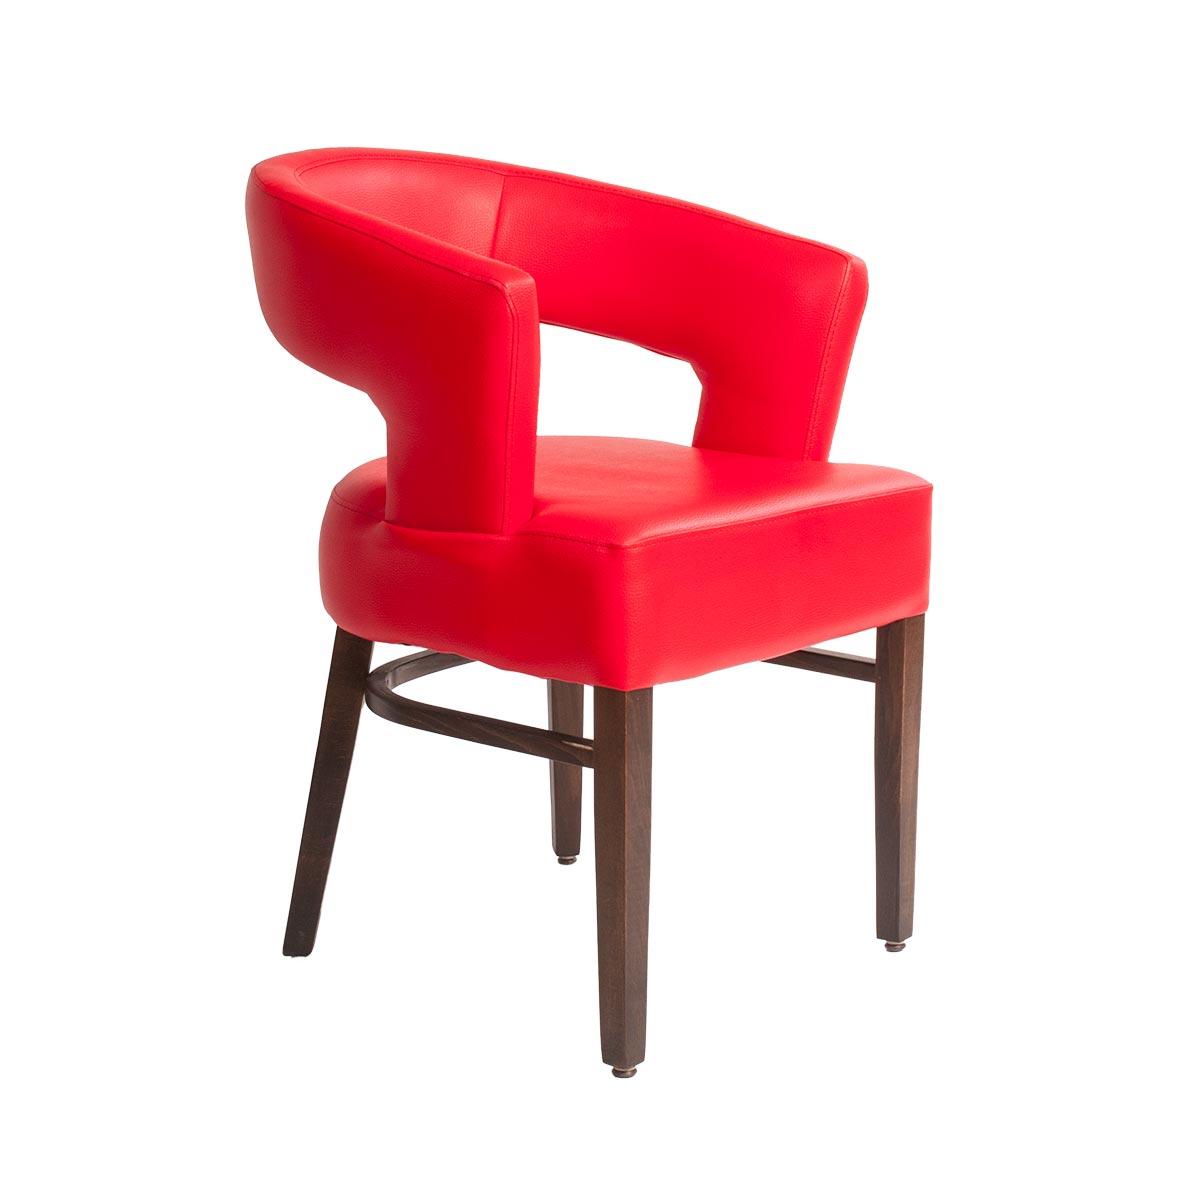 Funky Arm fotelja - Detal proizvodnja nameštaja